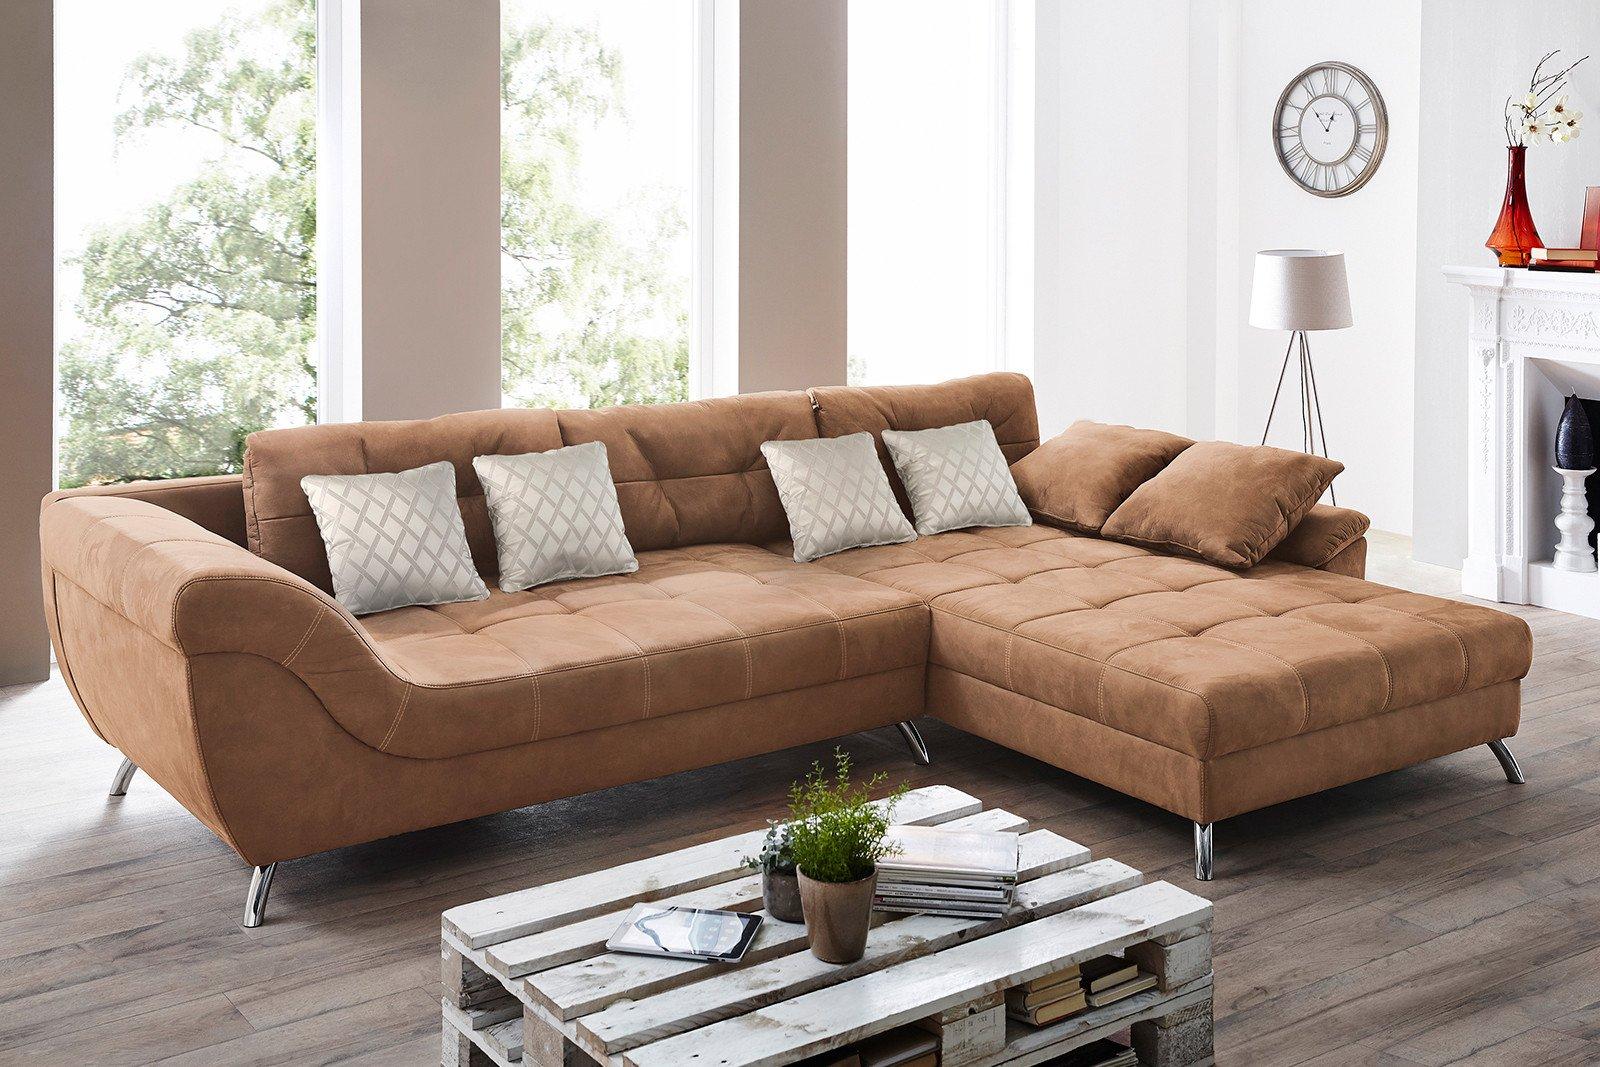 ecksofa san francisco rotbraun von jockenh fer m bel letz ihr online shop. Black Bedroom Furniture Sets. Home Design Ideas